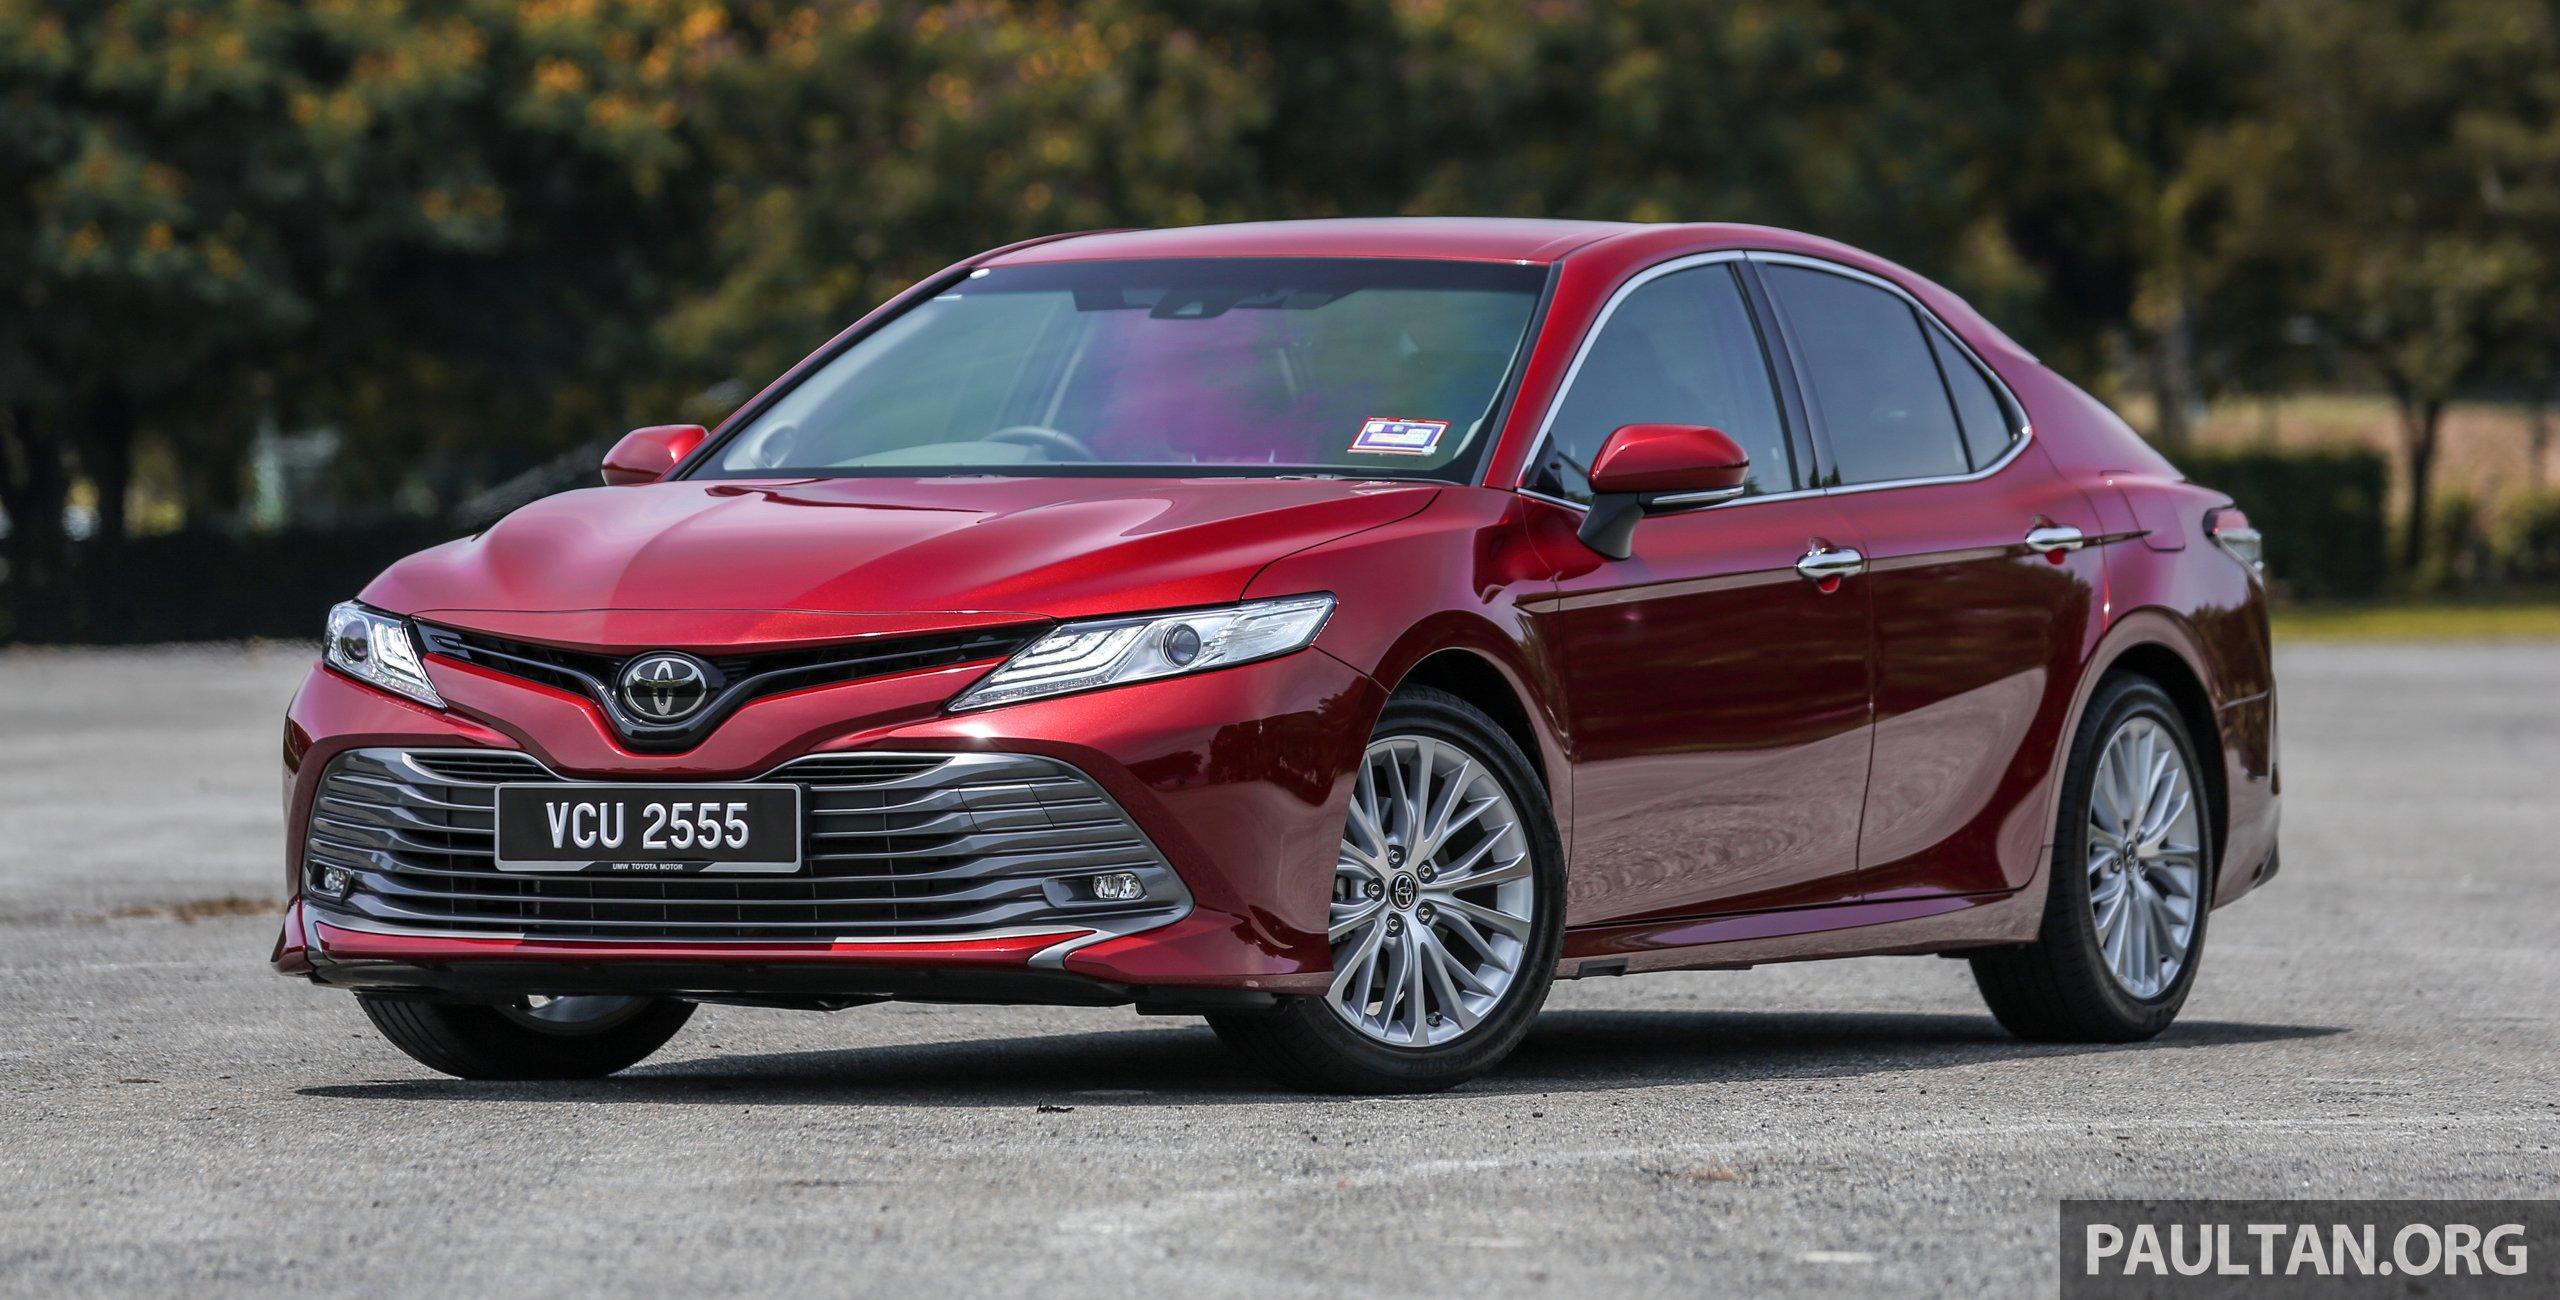 Kelebihan Kekurangan Harga Toyota Camry Review